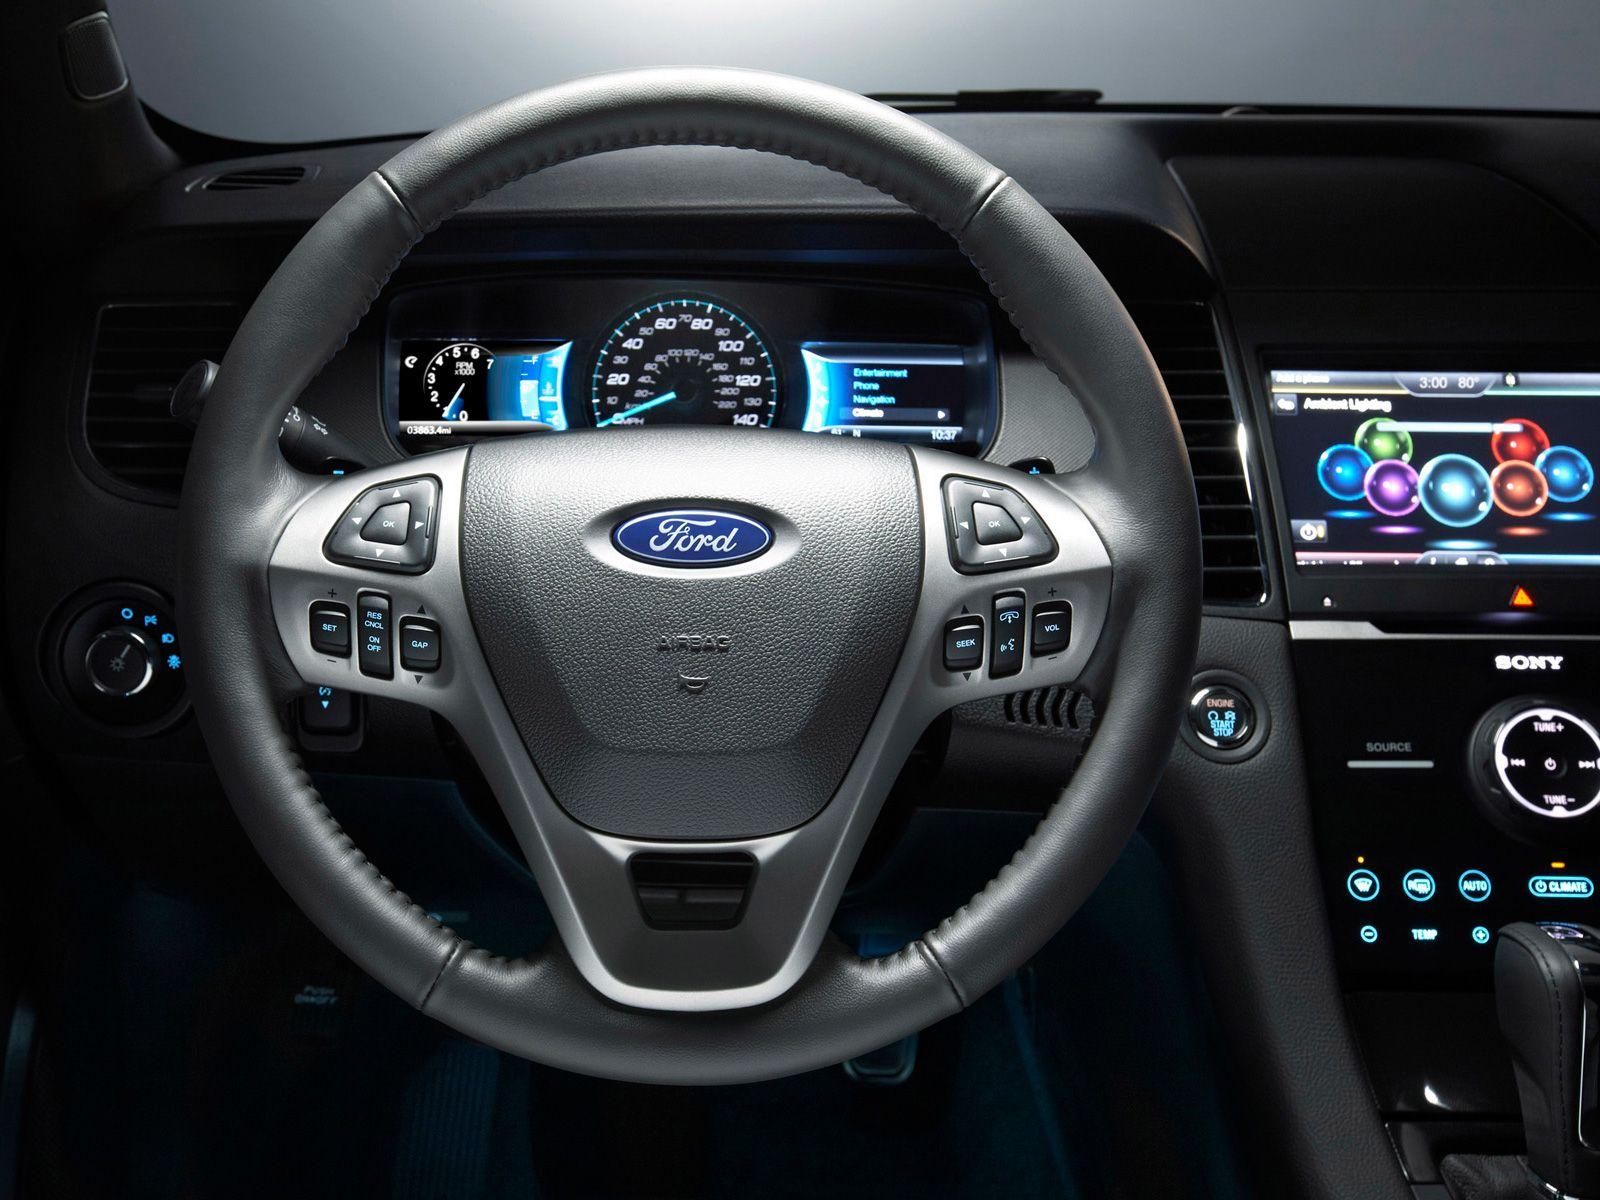 2015 ford taurus sho dashboard interior cool car design